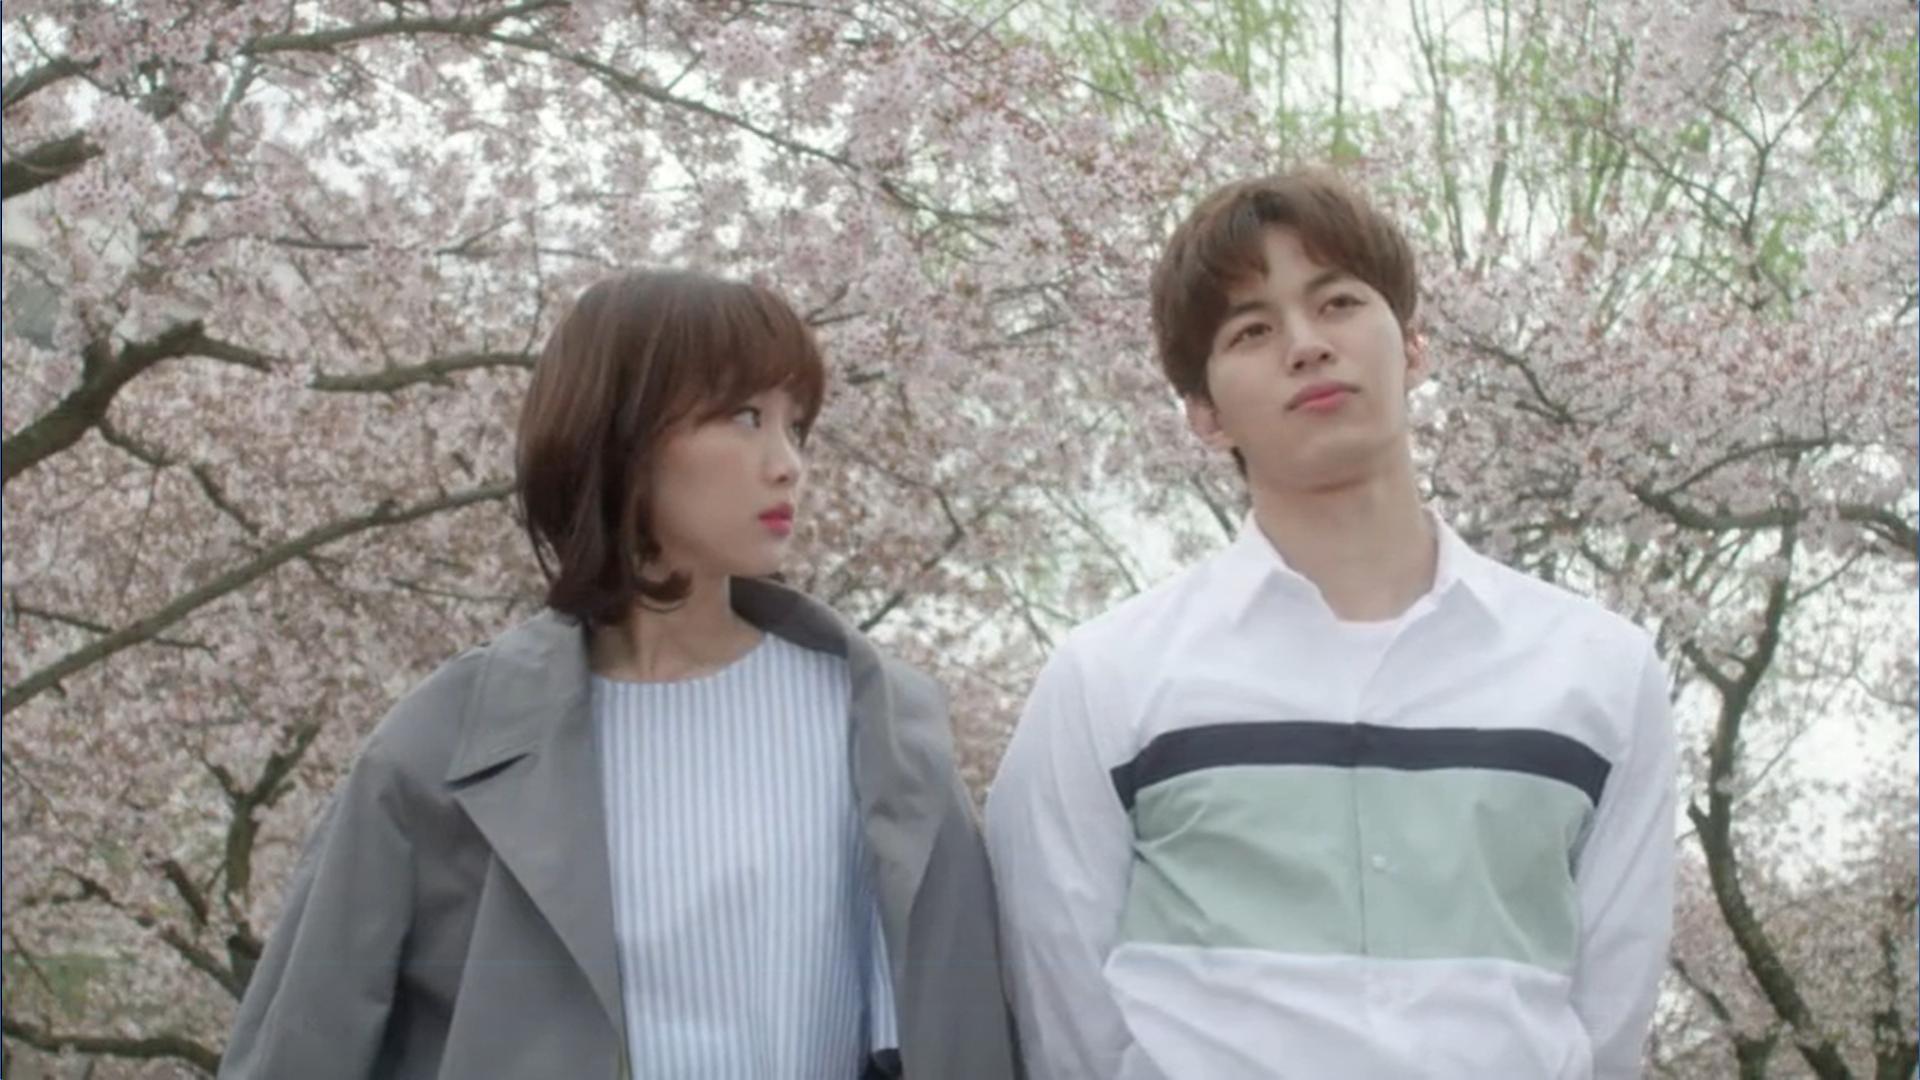 Wednesday 3:30 PM Seon Eun-woo and Yoon Jae-won putting jacket on her